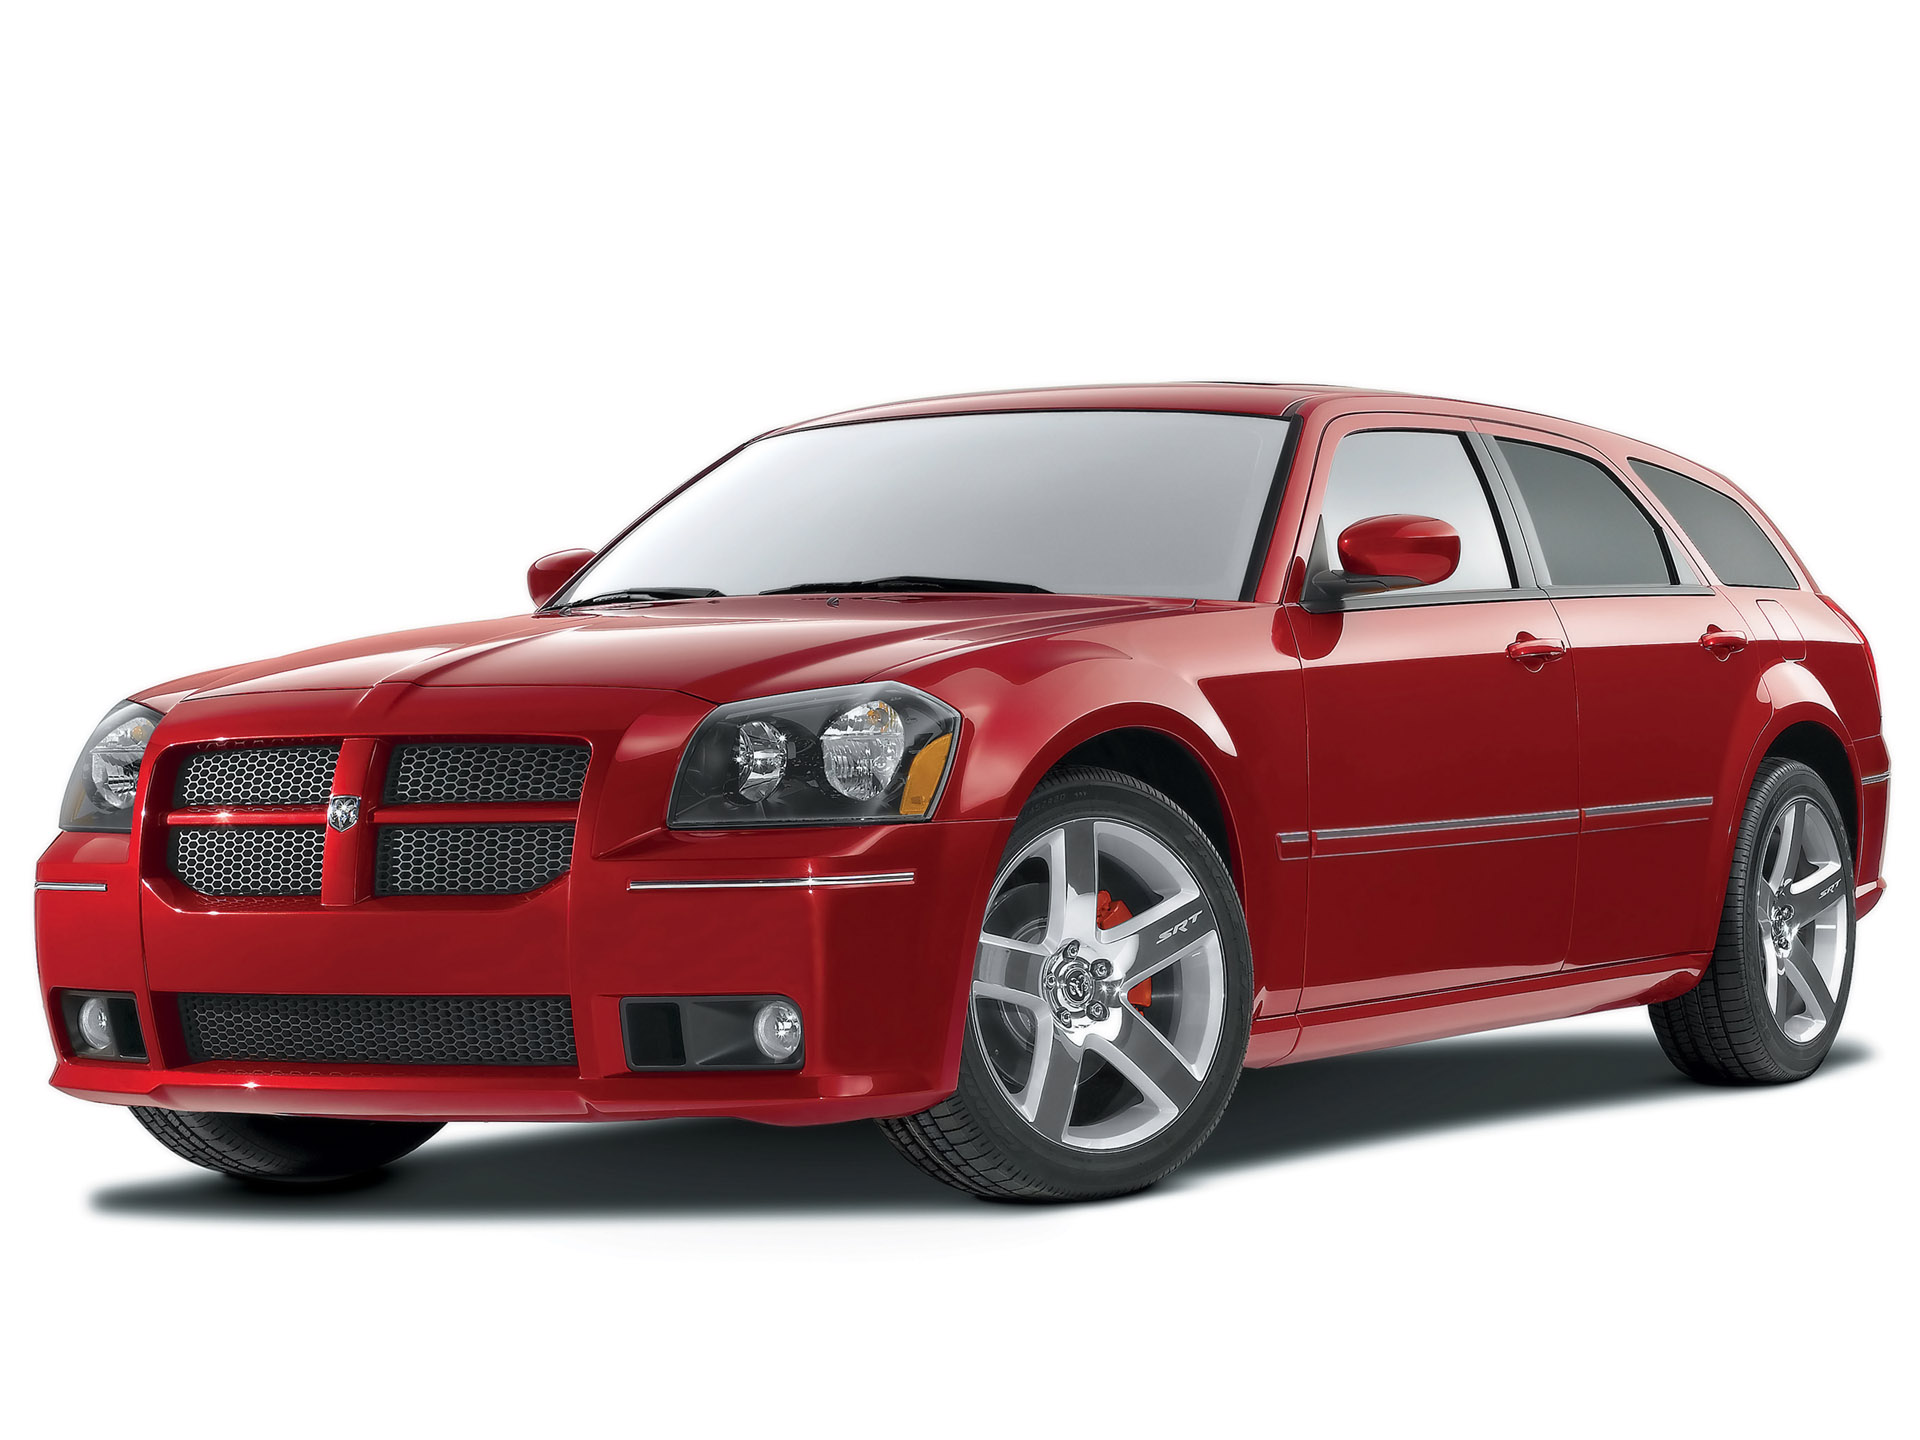 2006-Dodge-Magnum-SRT8-SA-Studio-1920x1440.jpg